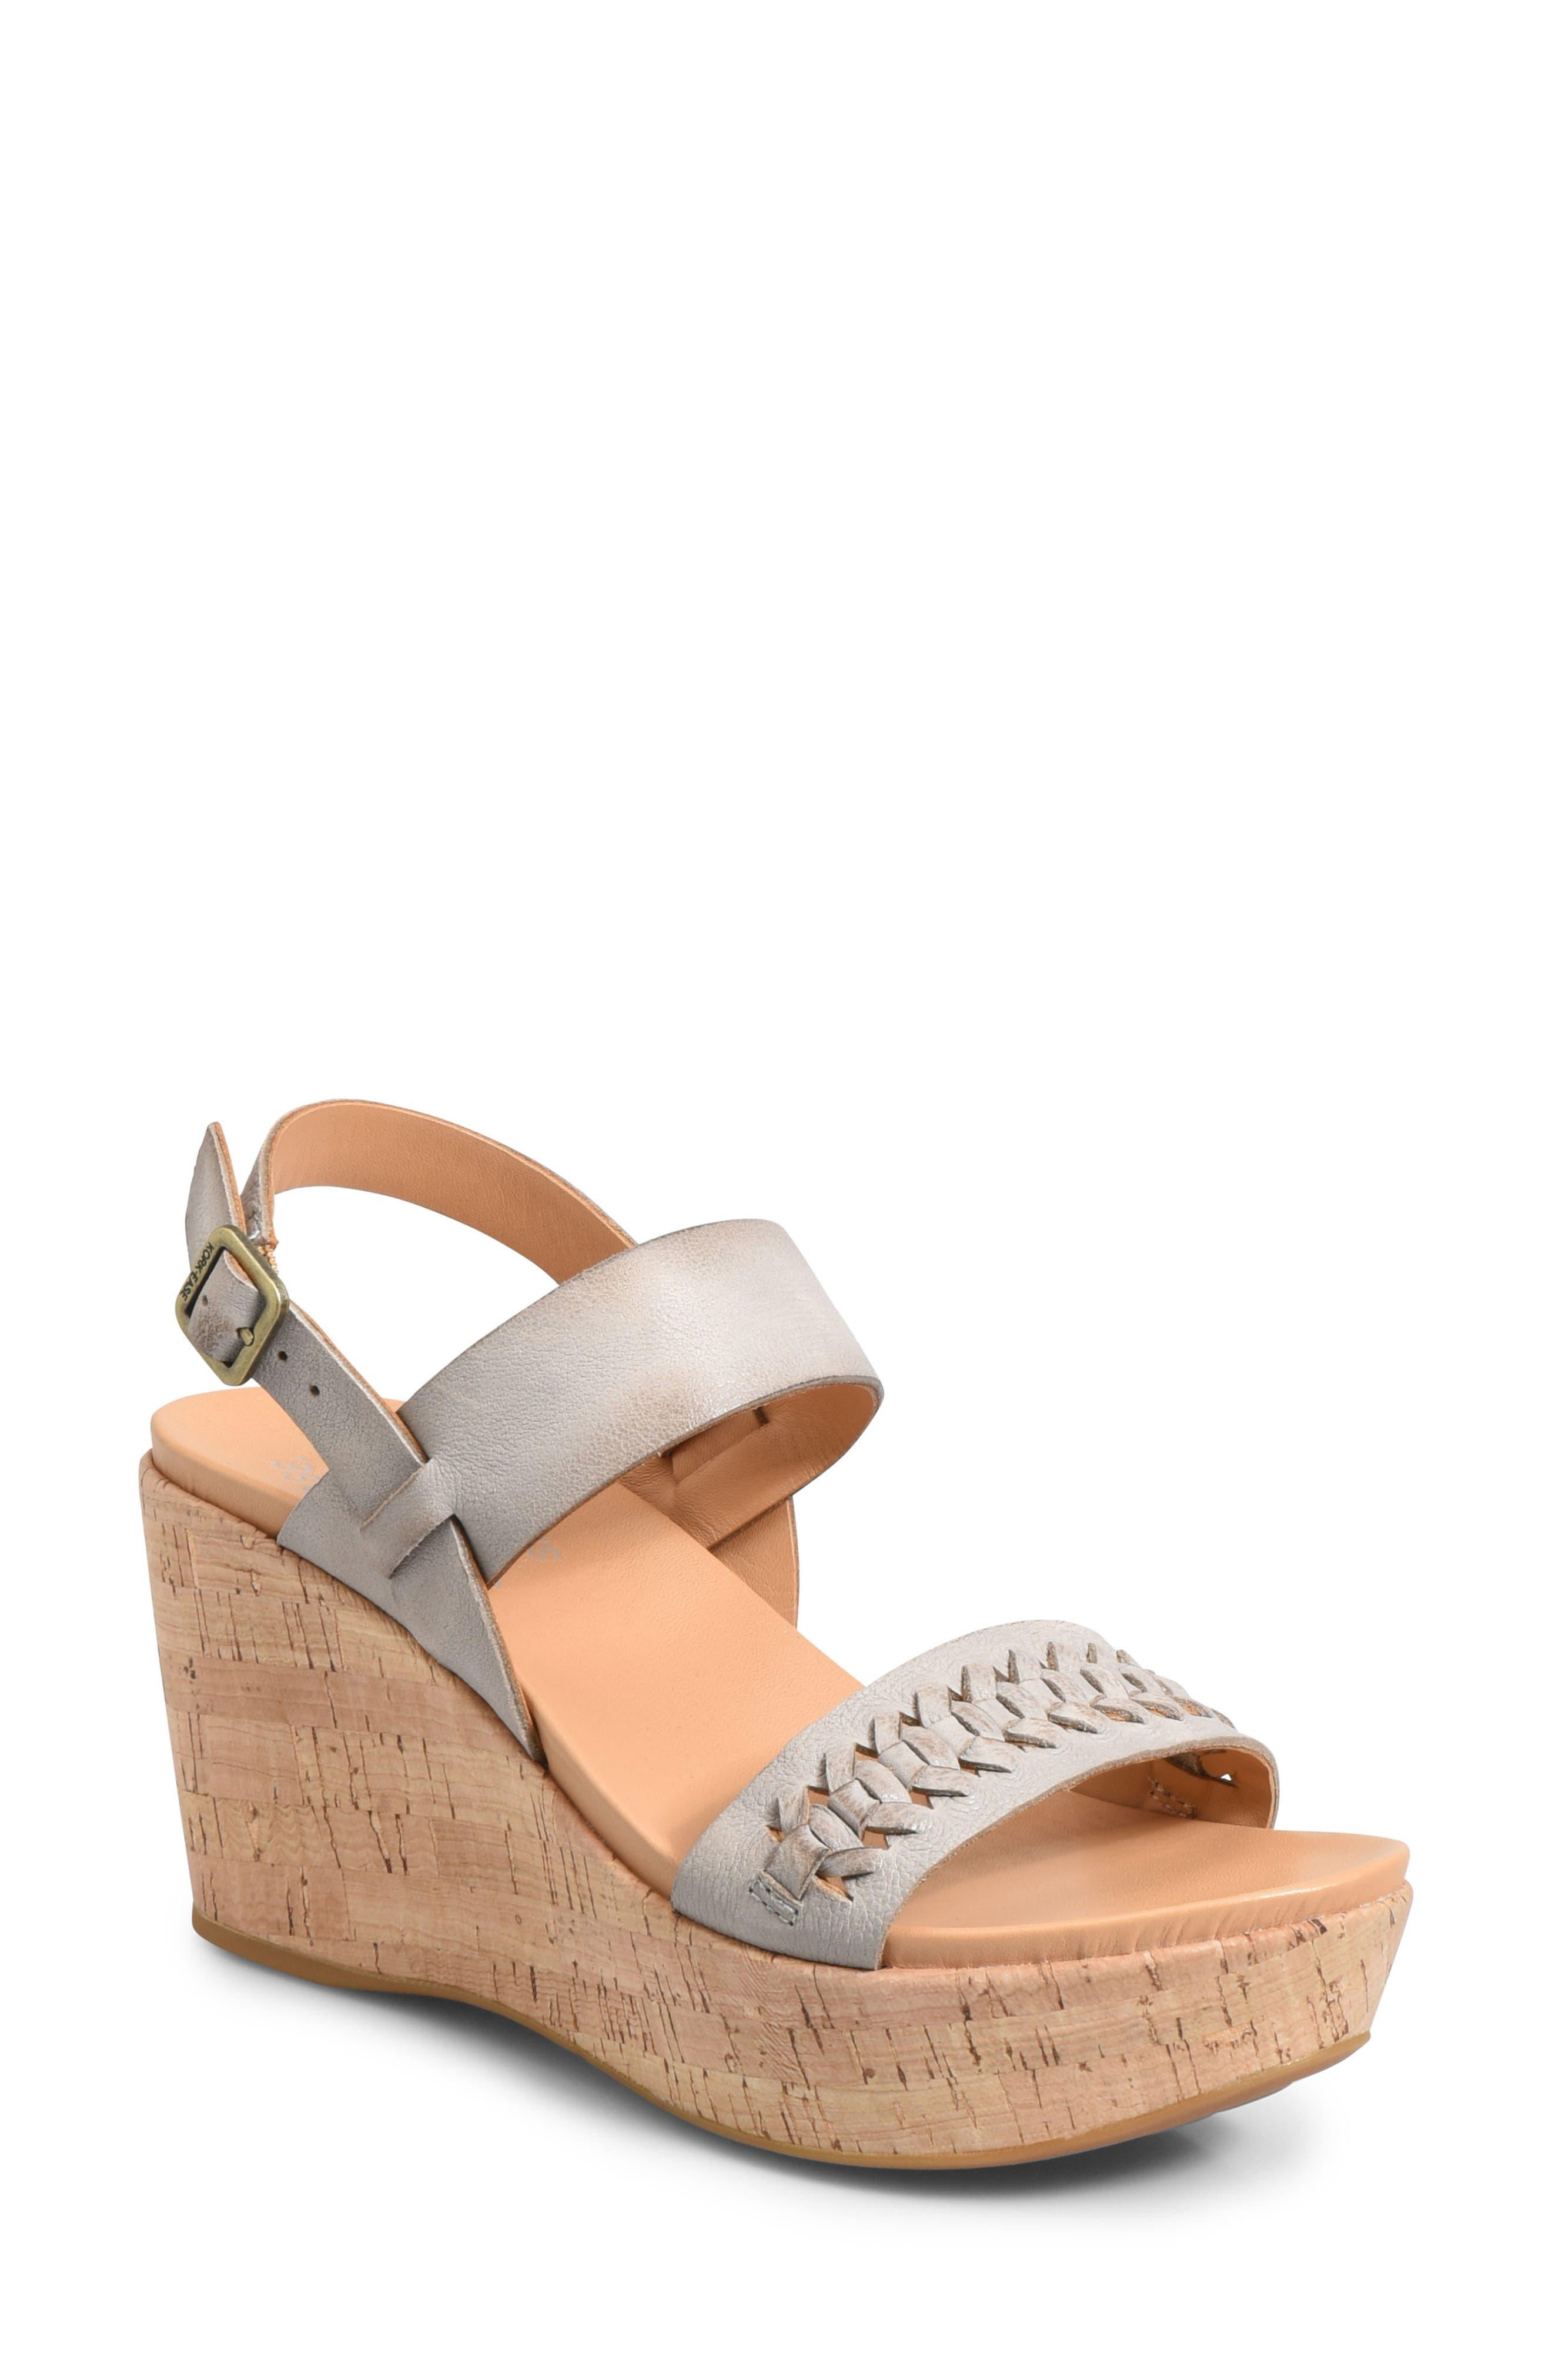 6ccf260b1 Kork-Ease Austin Braid Wedge Sandal